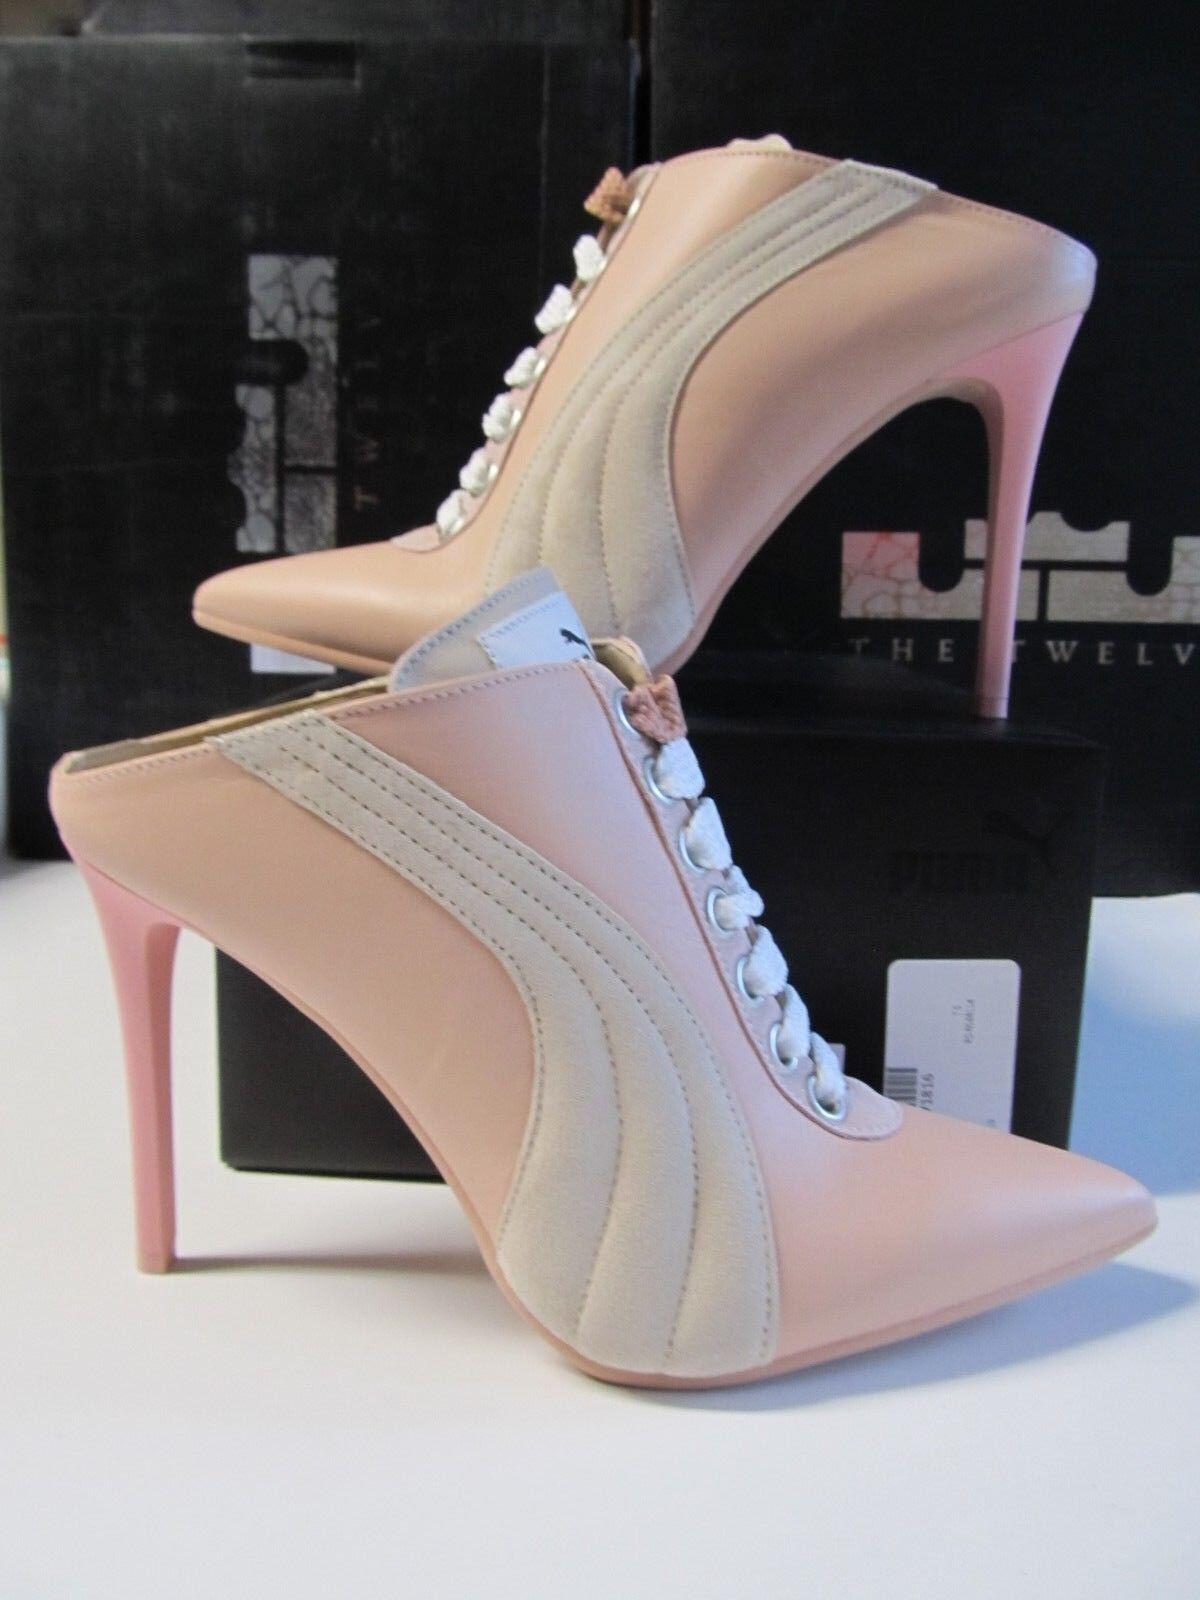 Women Puma FENTY RIHANNA Lace Up Mule Heel $400 ITALY Pink LEATHER 7.5 364468 01